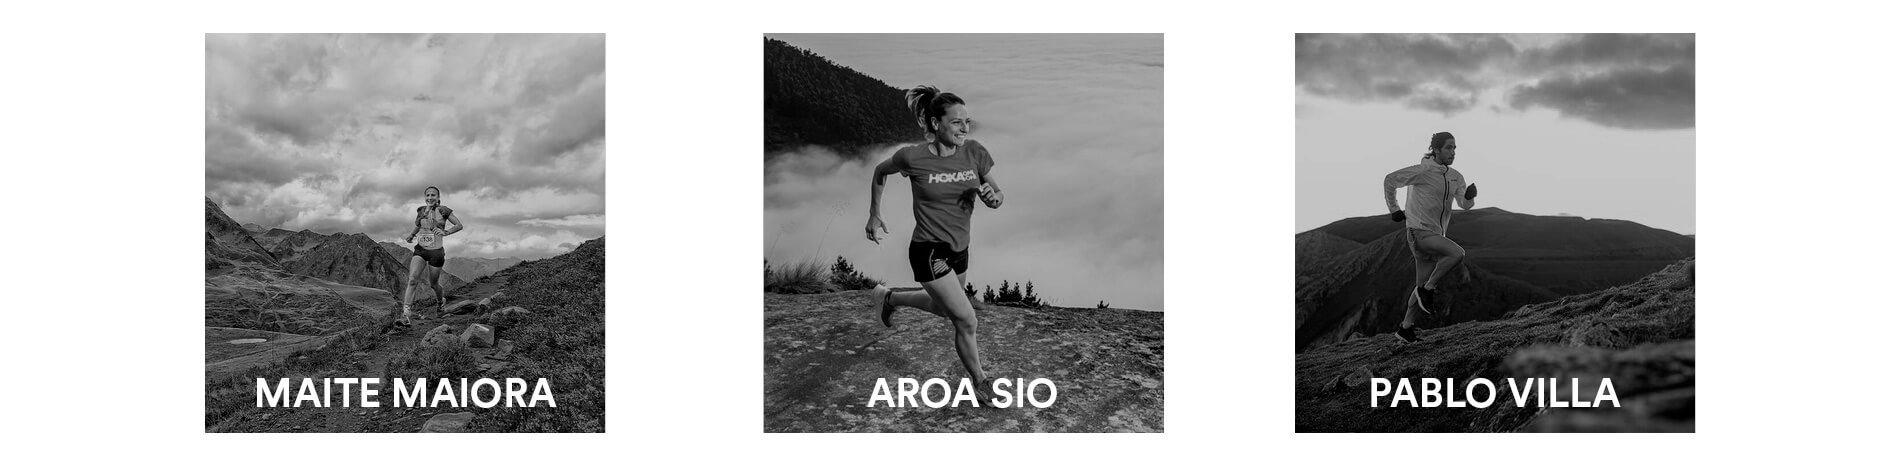 Trail running competicion atletas 3